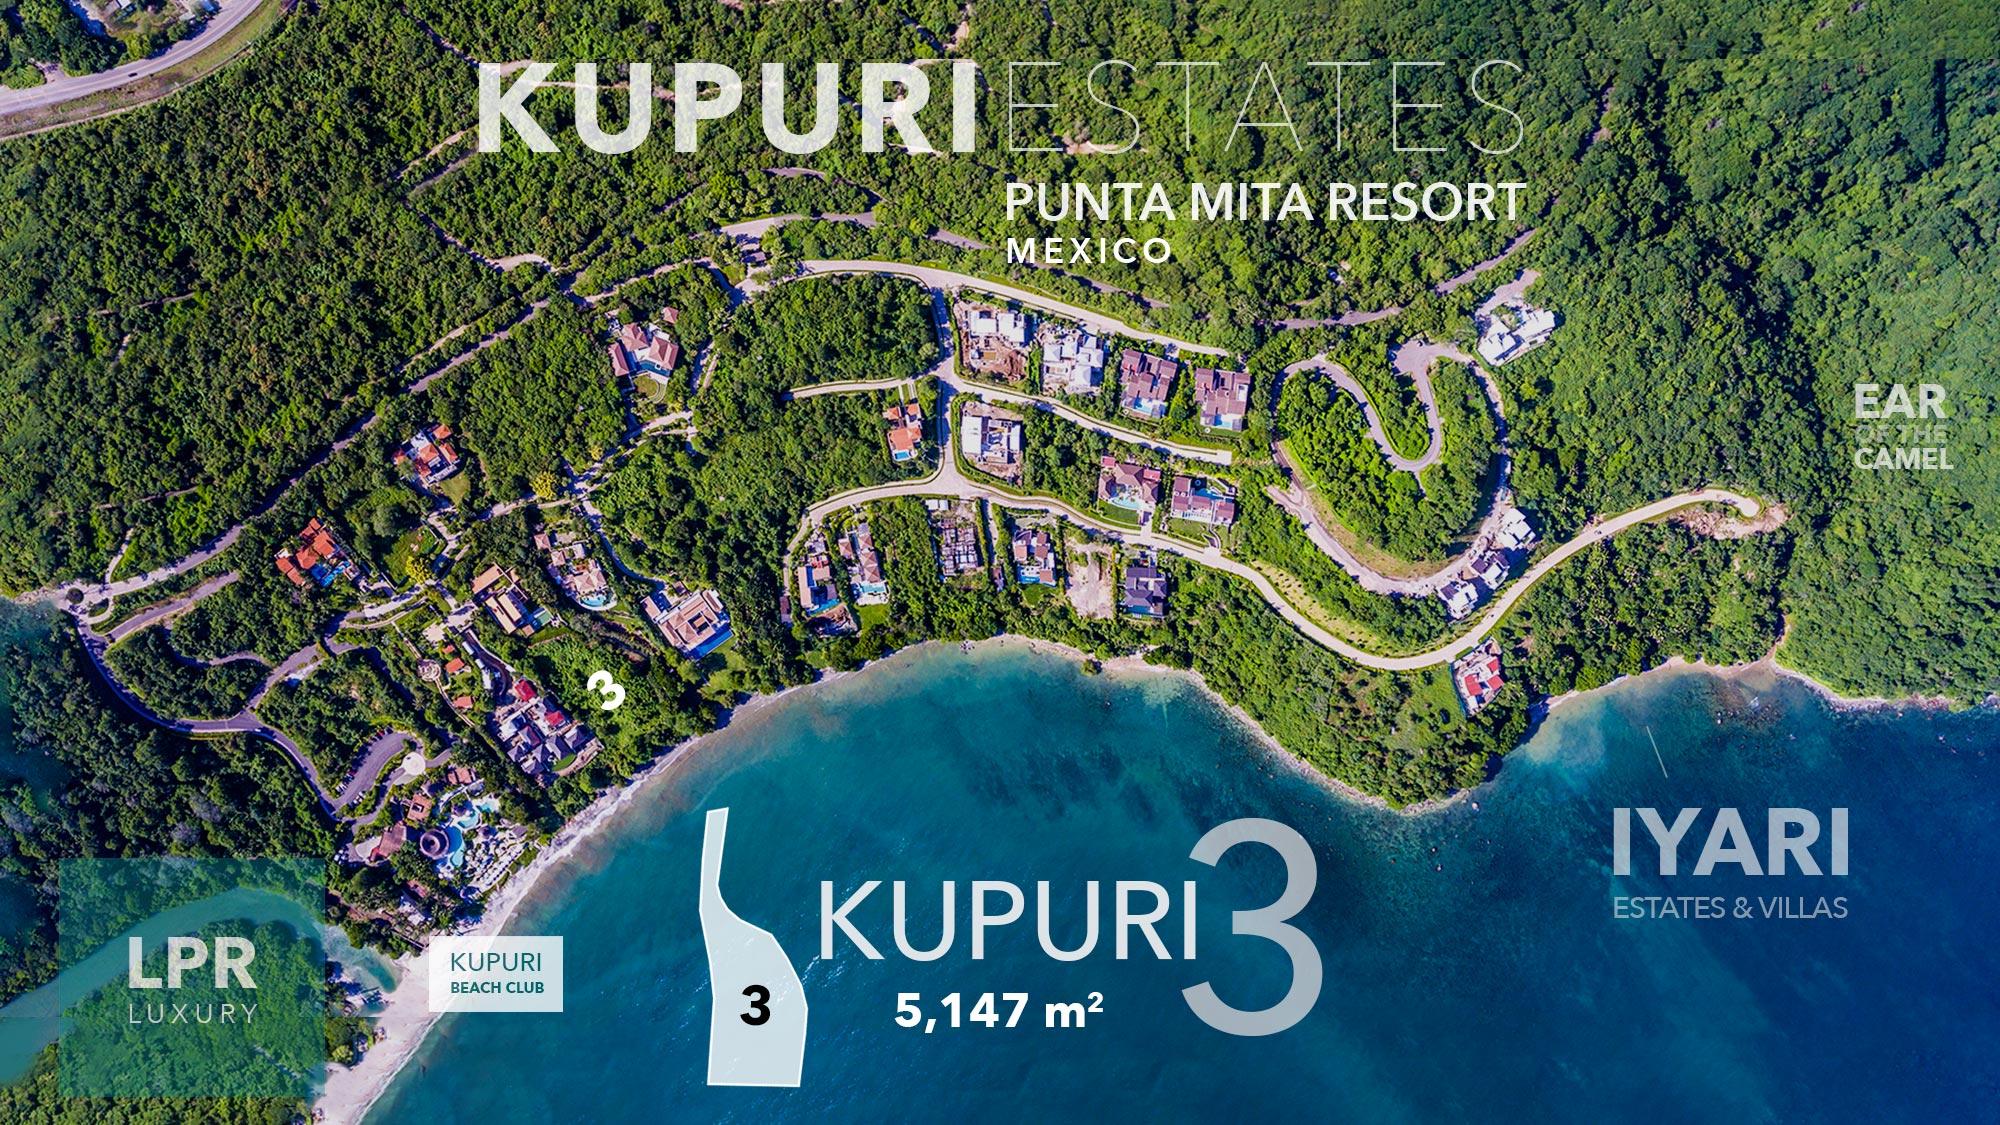 Kupuri Estates - Lot 3 - Punta Mita Resort - Luxury real estate for sale - Homesite building lots in Puerto Vallarta, Mexico